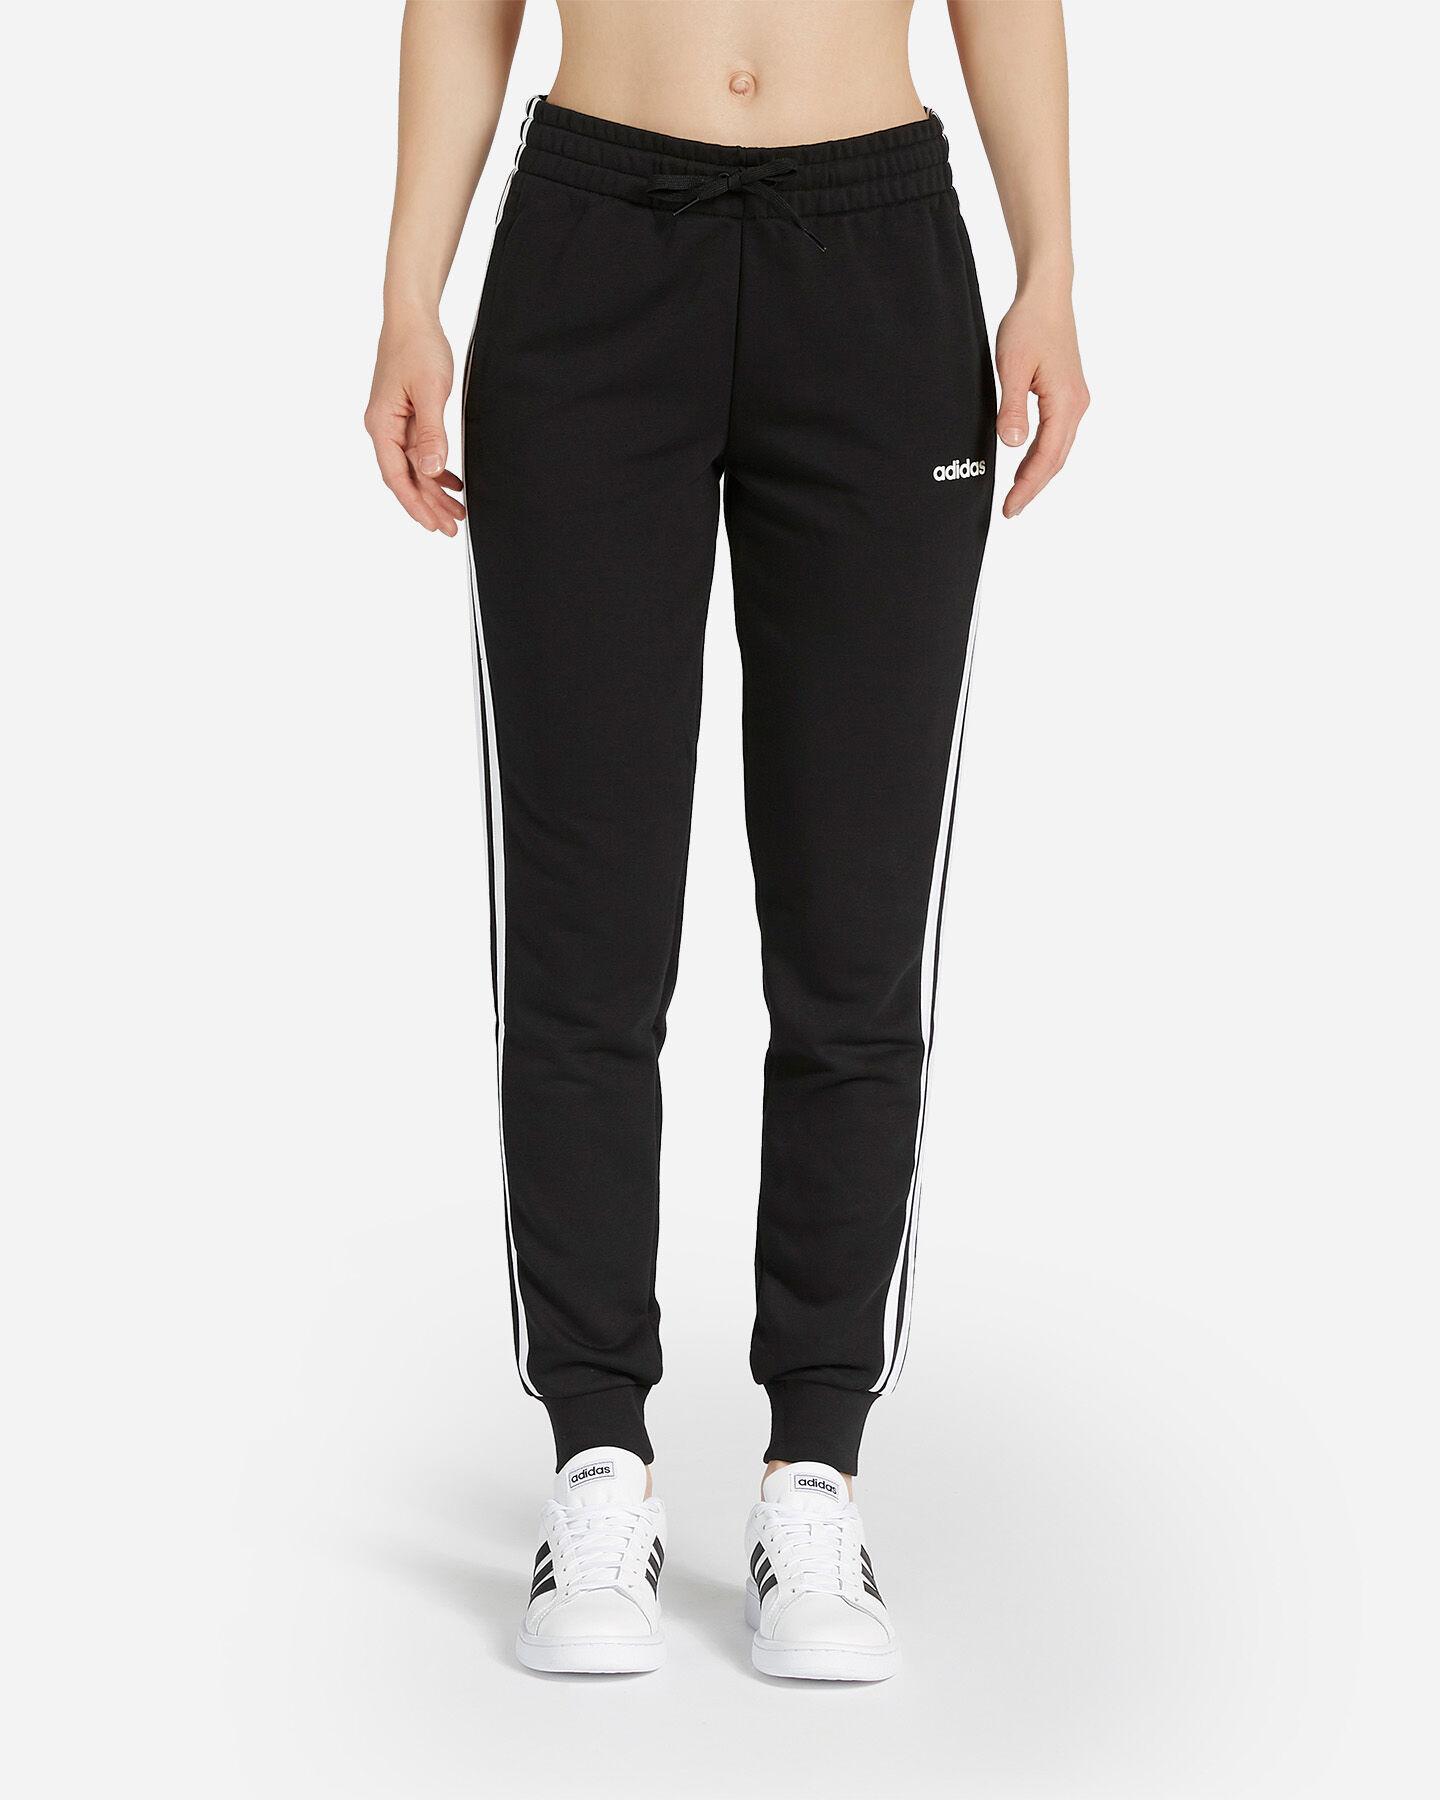 Pantalone ADIDAS ESSENTIALS 3 STRIPES W S4056301 scatto 0